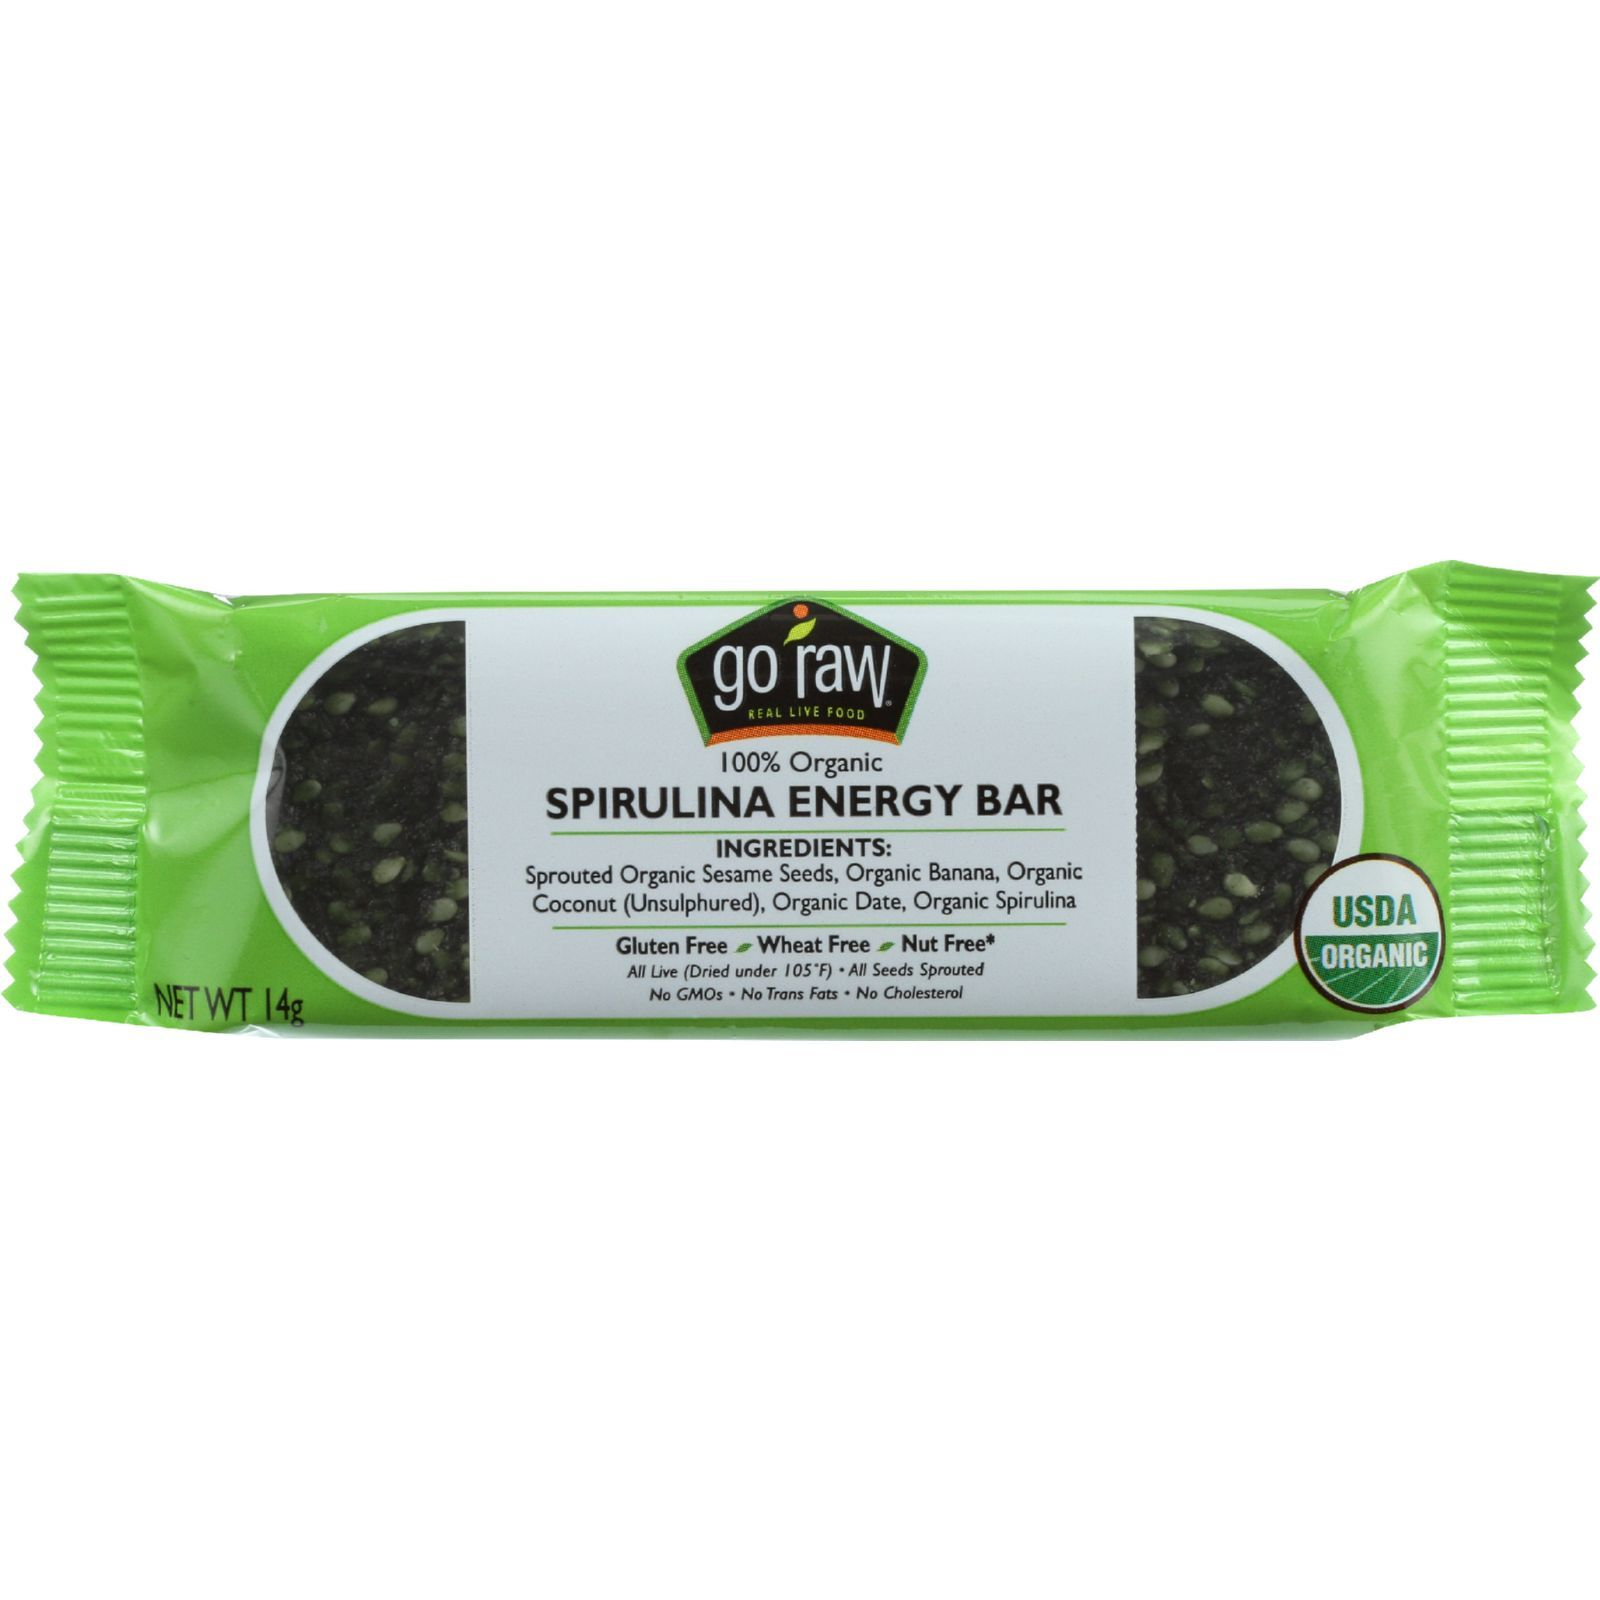 Go Raw Snack Bar - Organic - Sprouted - Spirulina Energy - Sweetened - .493 oz - case of 10